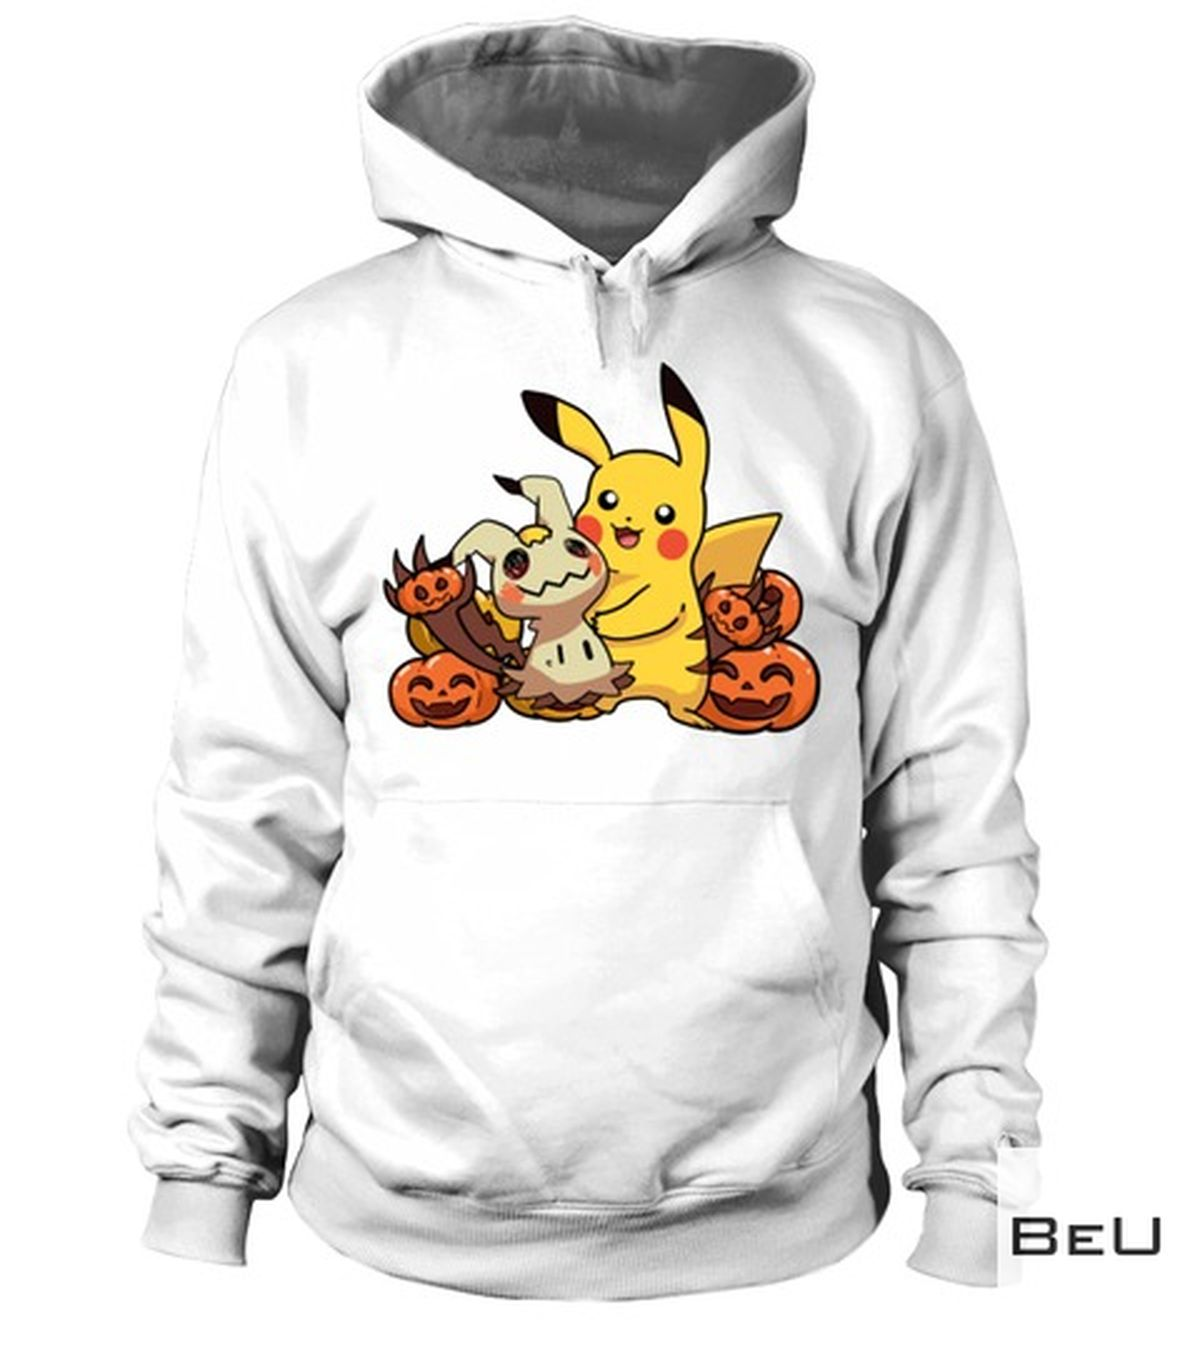 Clothing Pokemon Pikachu Pumpkin Halloween Shirt, hoodie, tank top